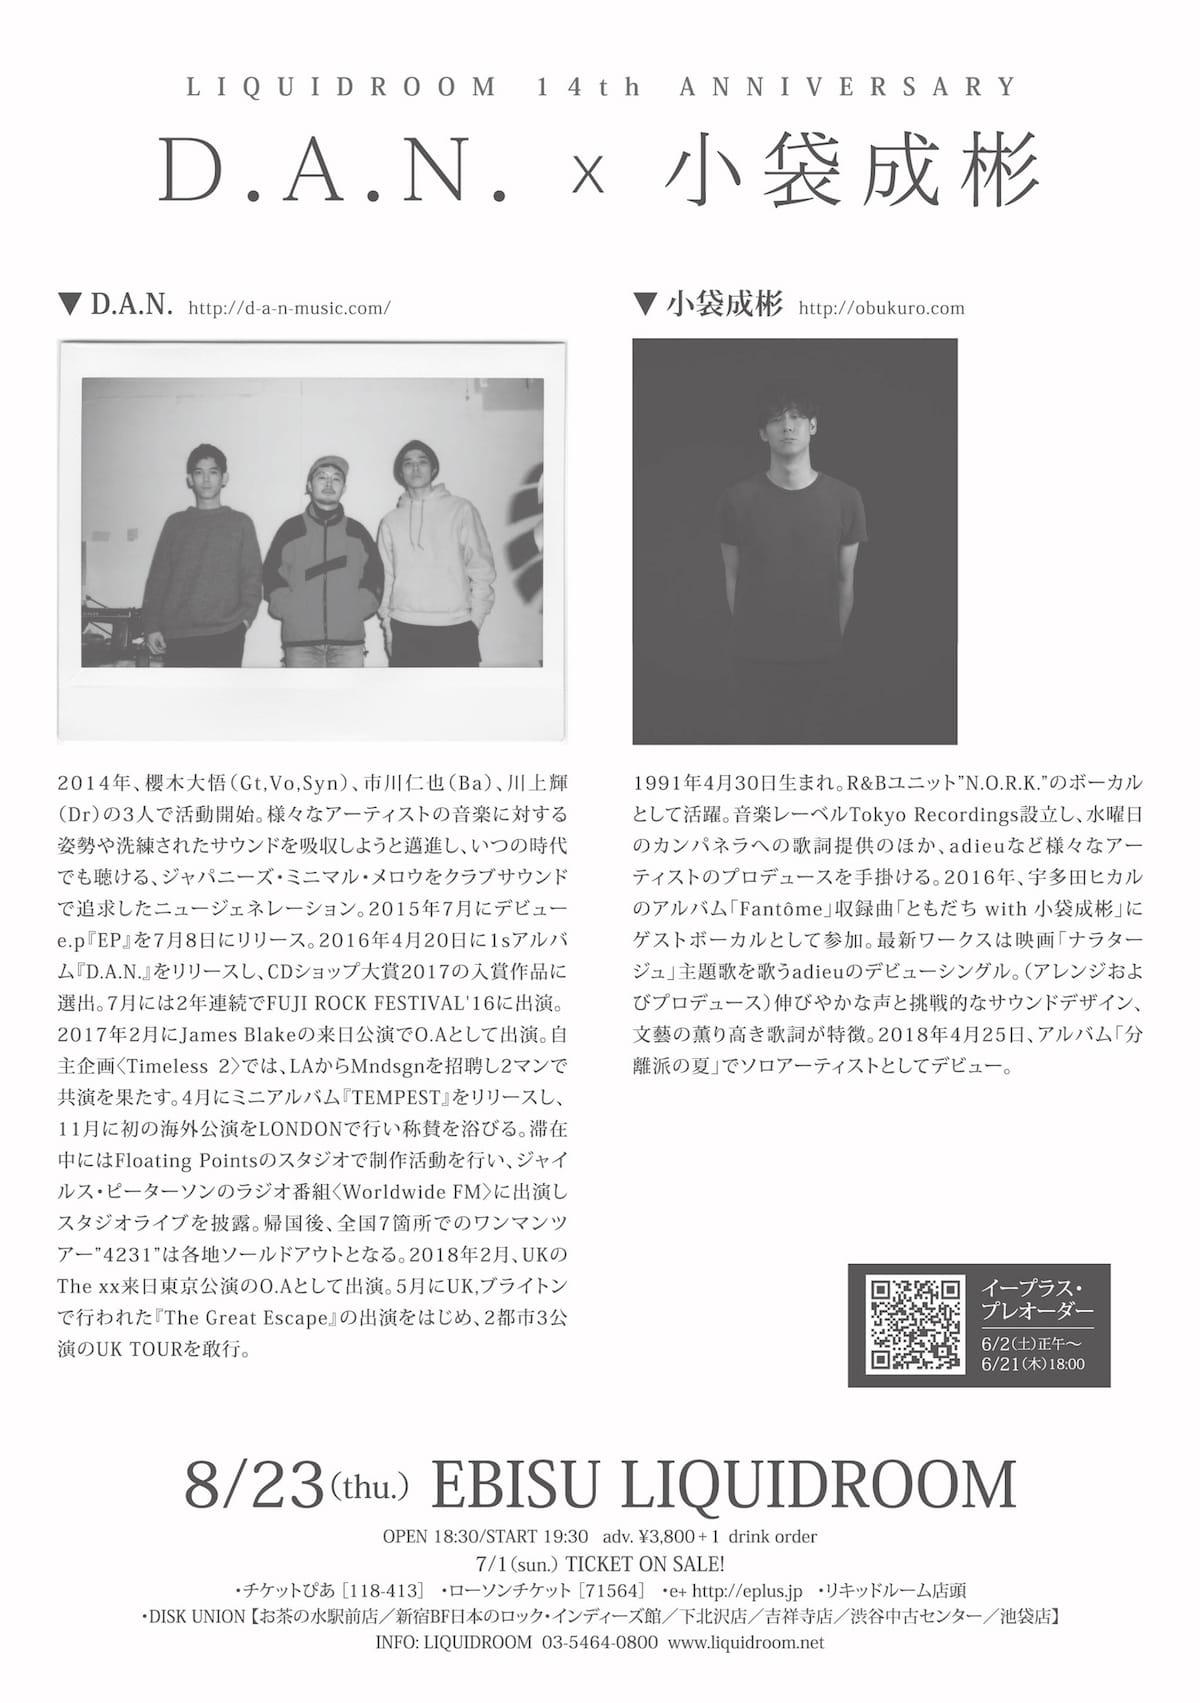 LIQUIDROOM14周年公演でD.A.N.と小袋成彬の2マンが決定 music180601-liquidroom-1-1-1200x1703